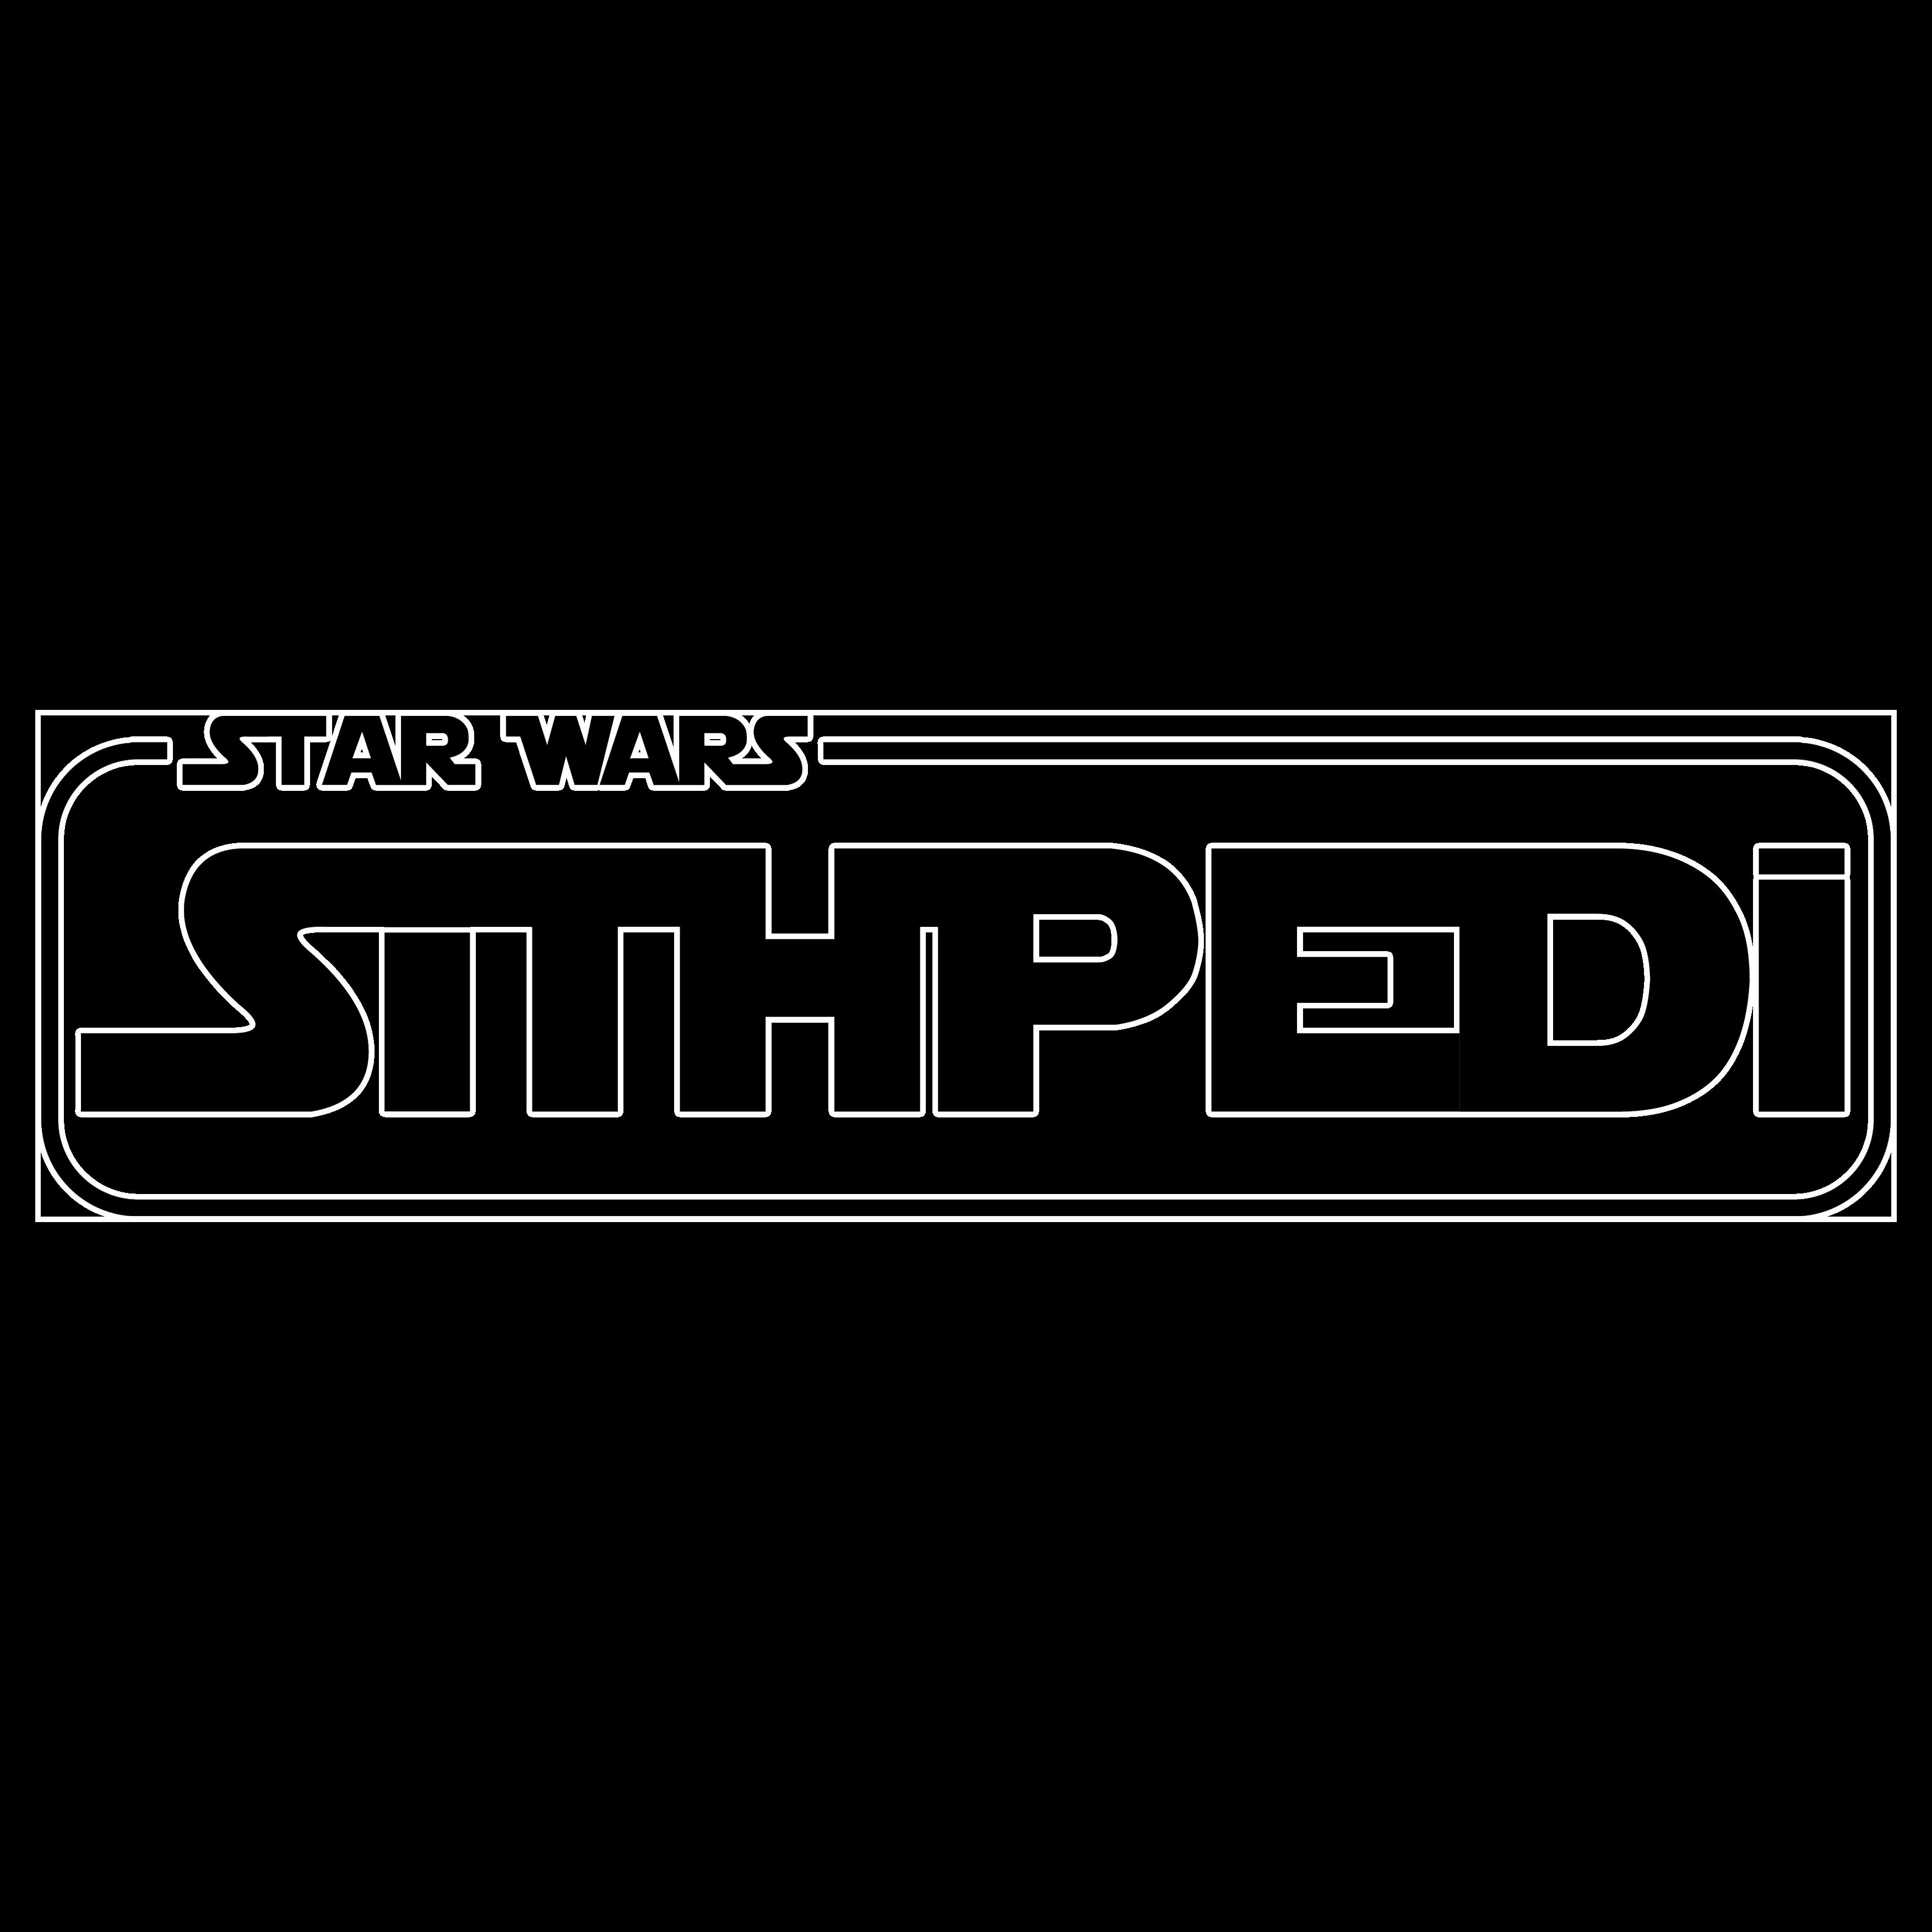 Sithpedi